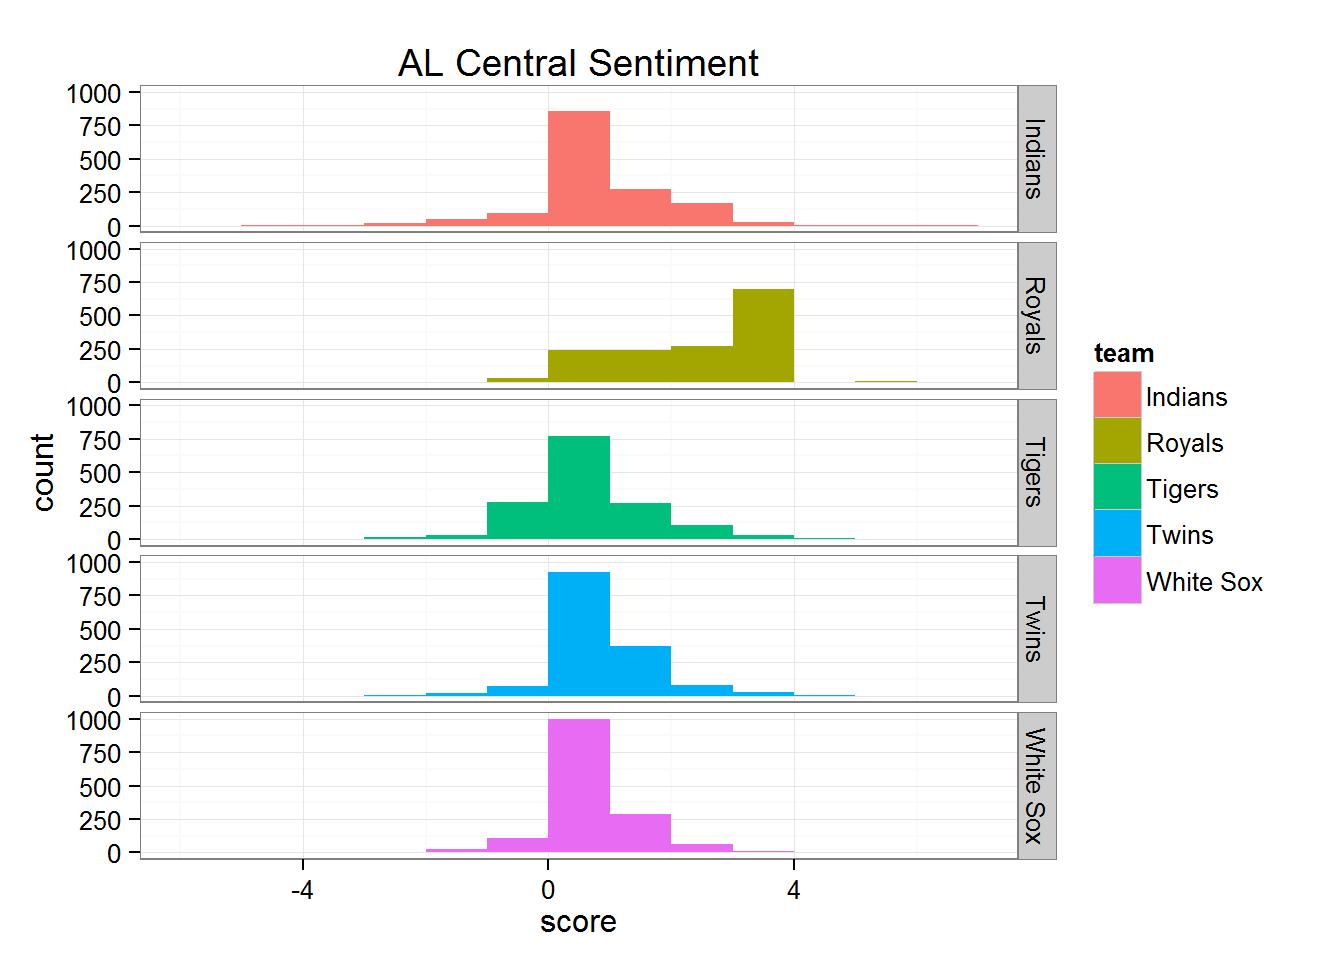 Ariball News - Sentiment Analysis for MLB Teams via Twitter